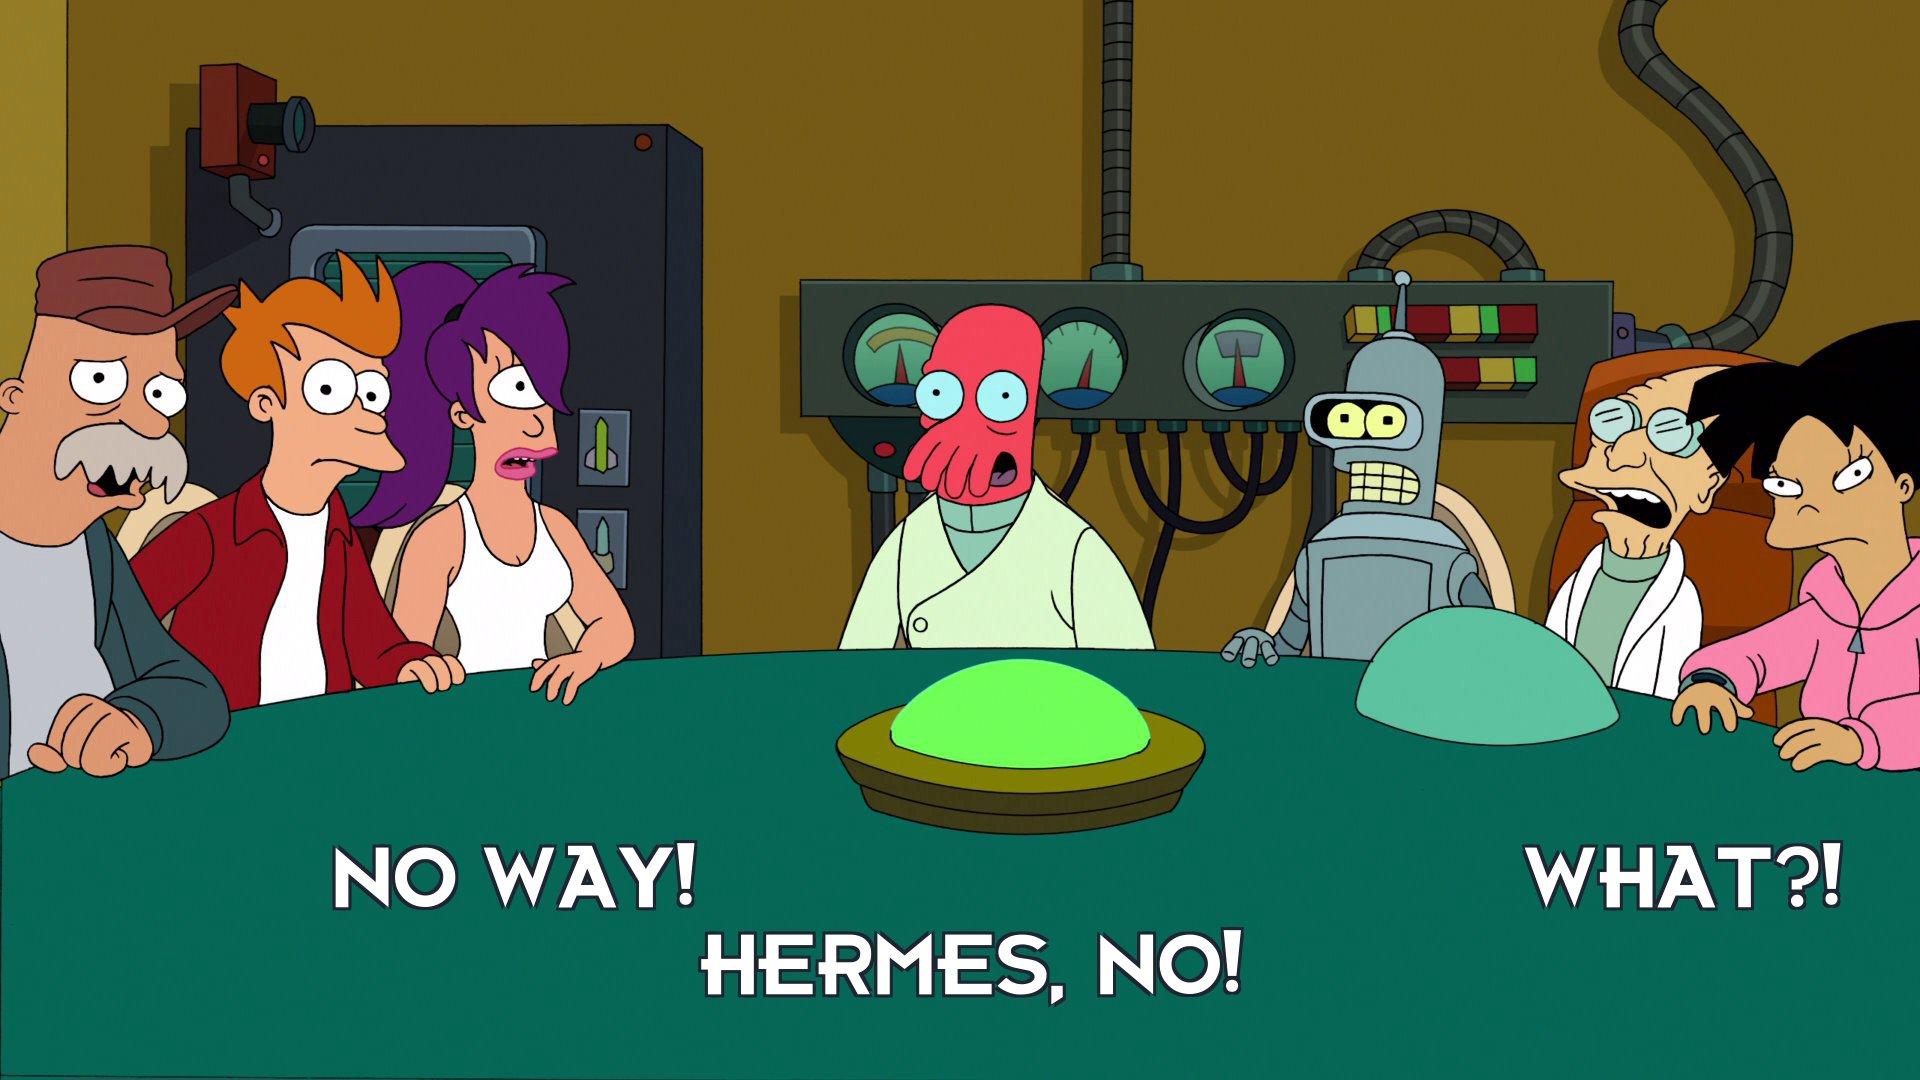 Amy Wong: What?!; Turanga Leela: No way!; Dr John A Zoidberg: Hermes, no!